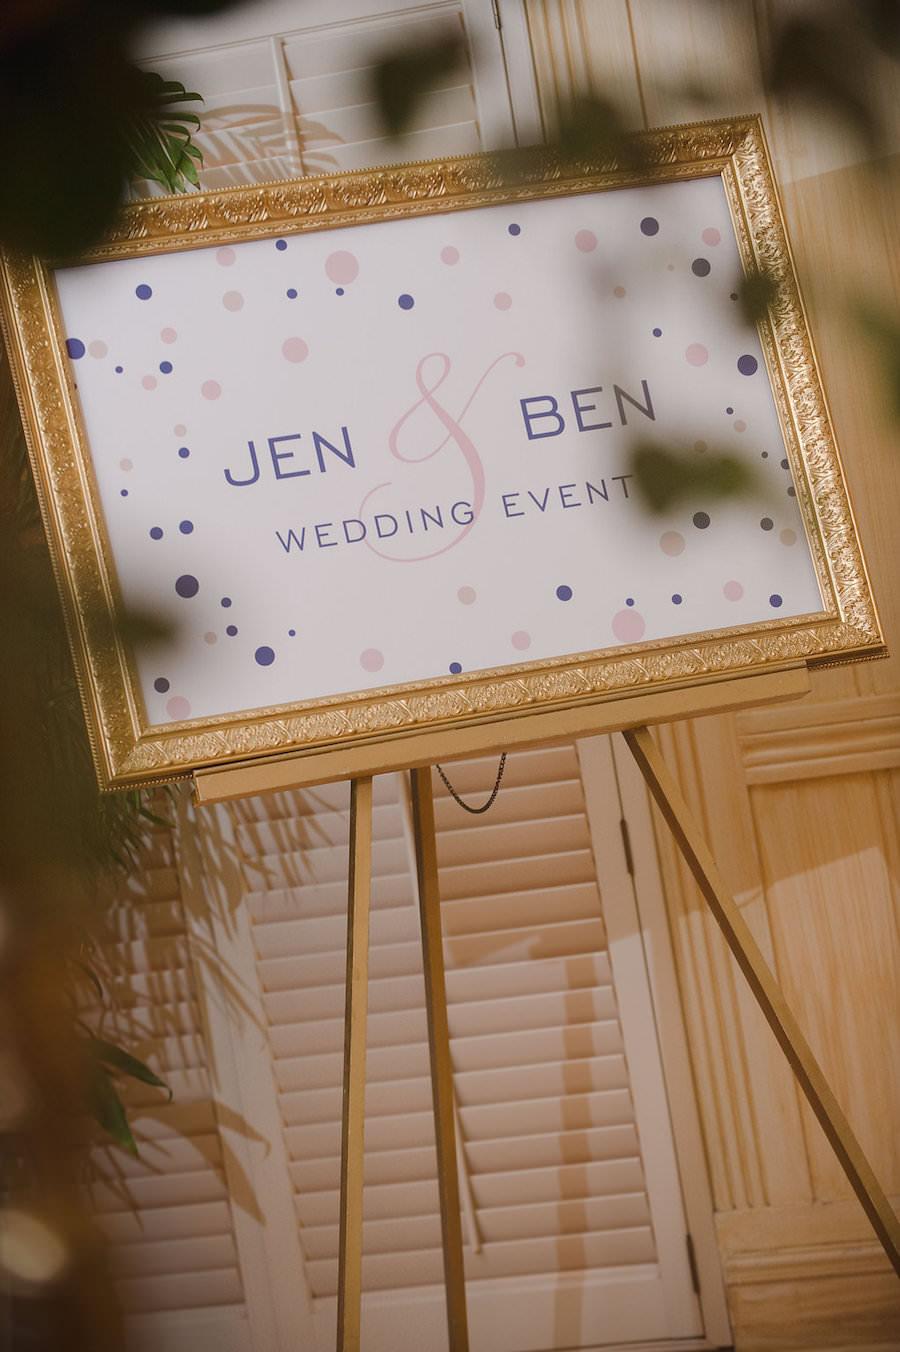 Pink and Blue Polka Dot Wedding Sign in Gold Frame | Wedding Reception Decor Inspiration